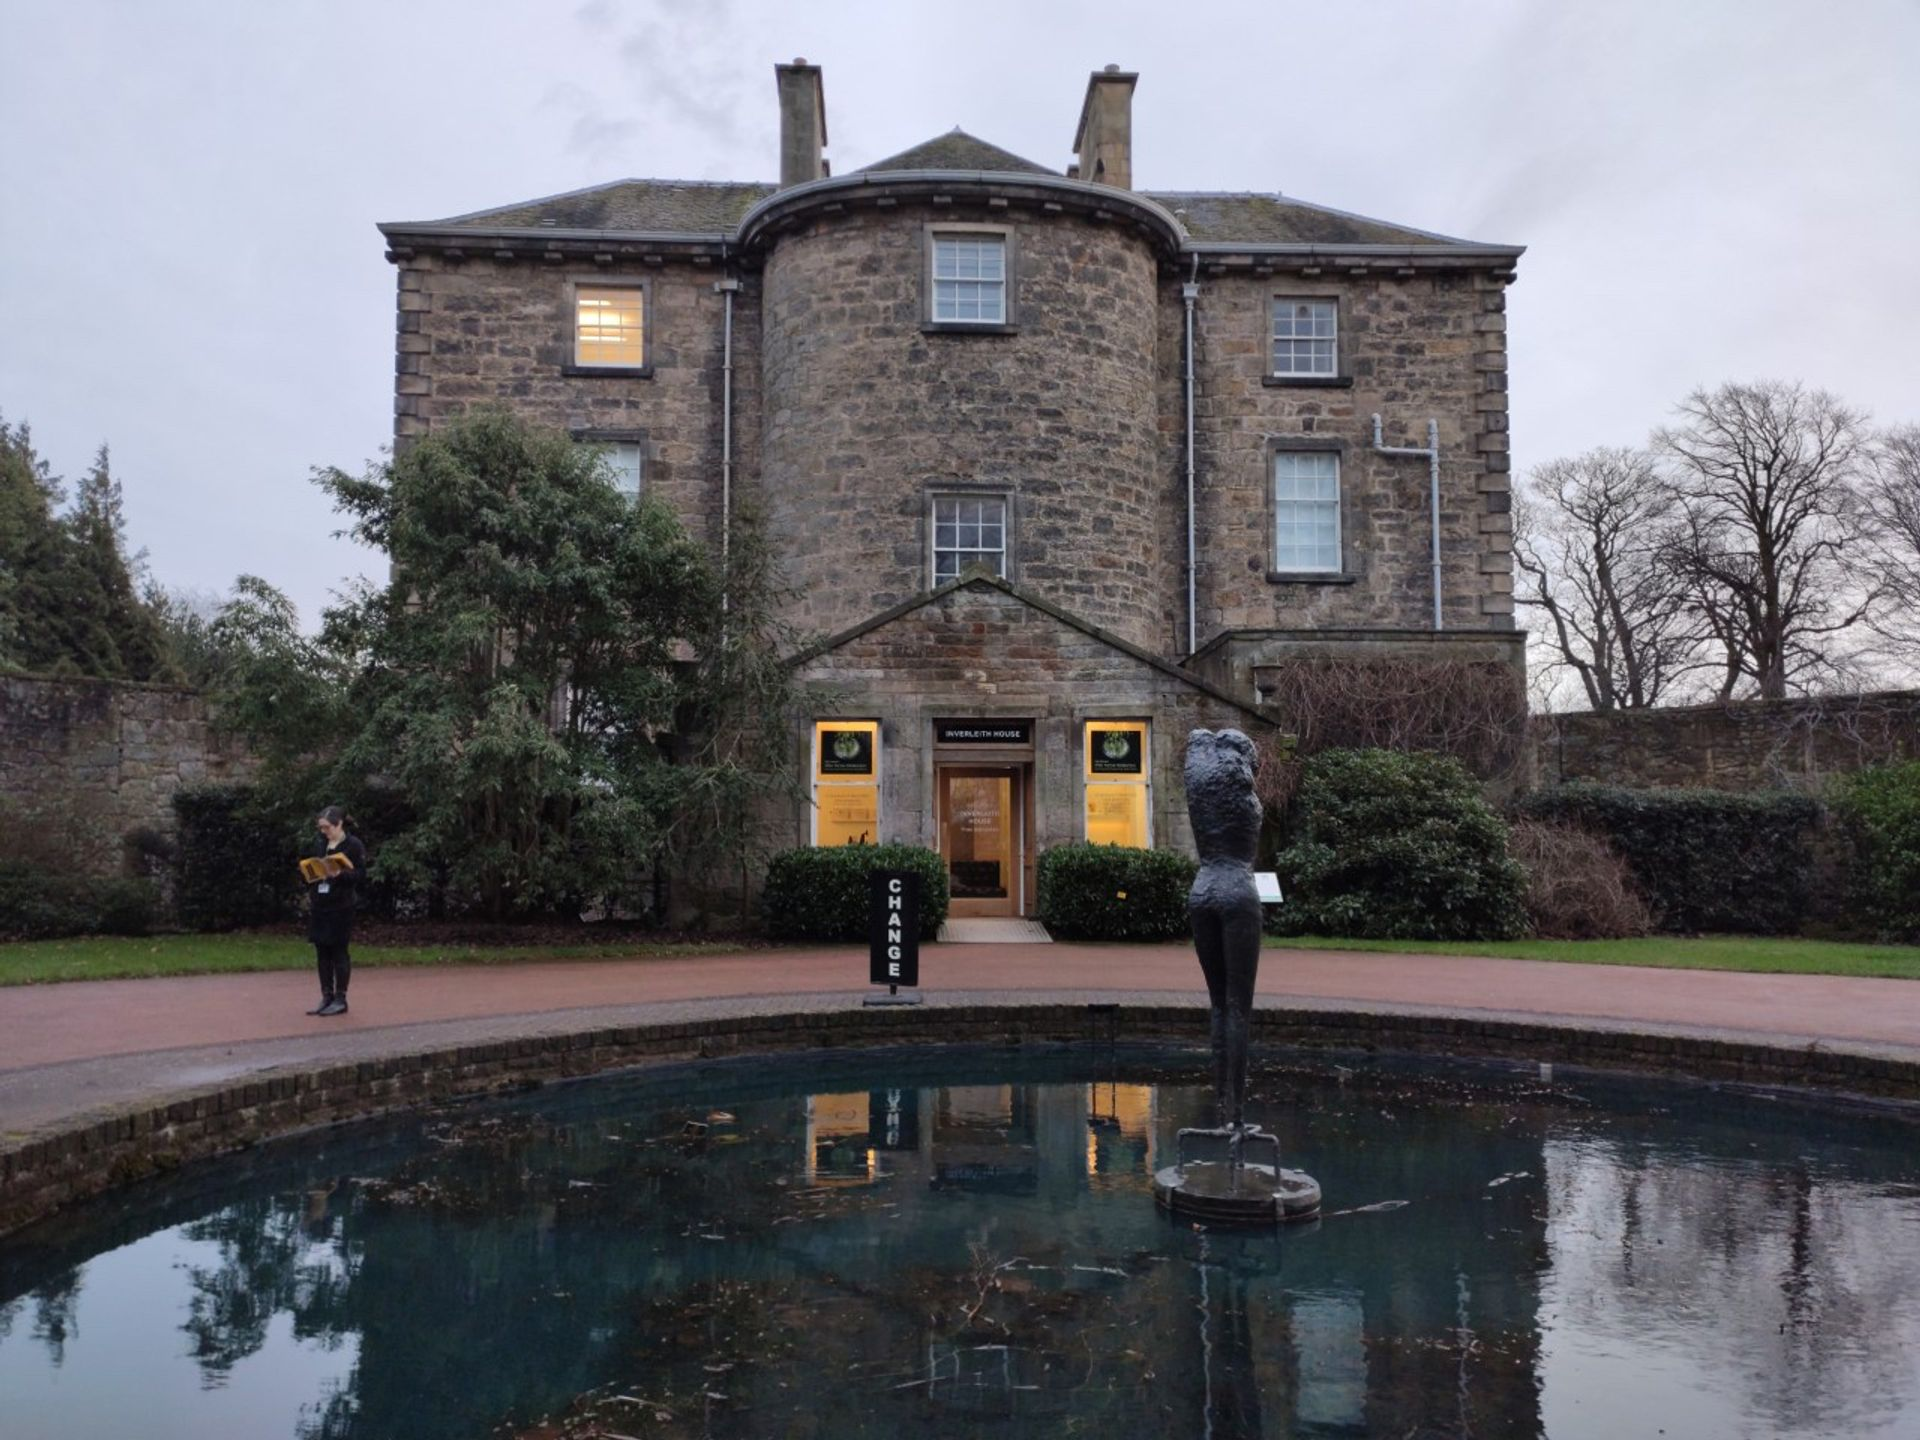 Inverleith House will become Climate House courtesy Royal Botanic Garden Edinburgh